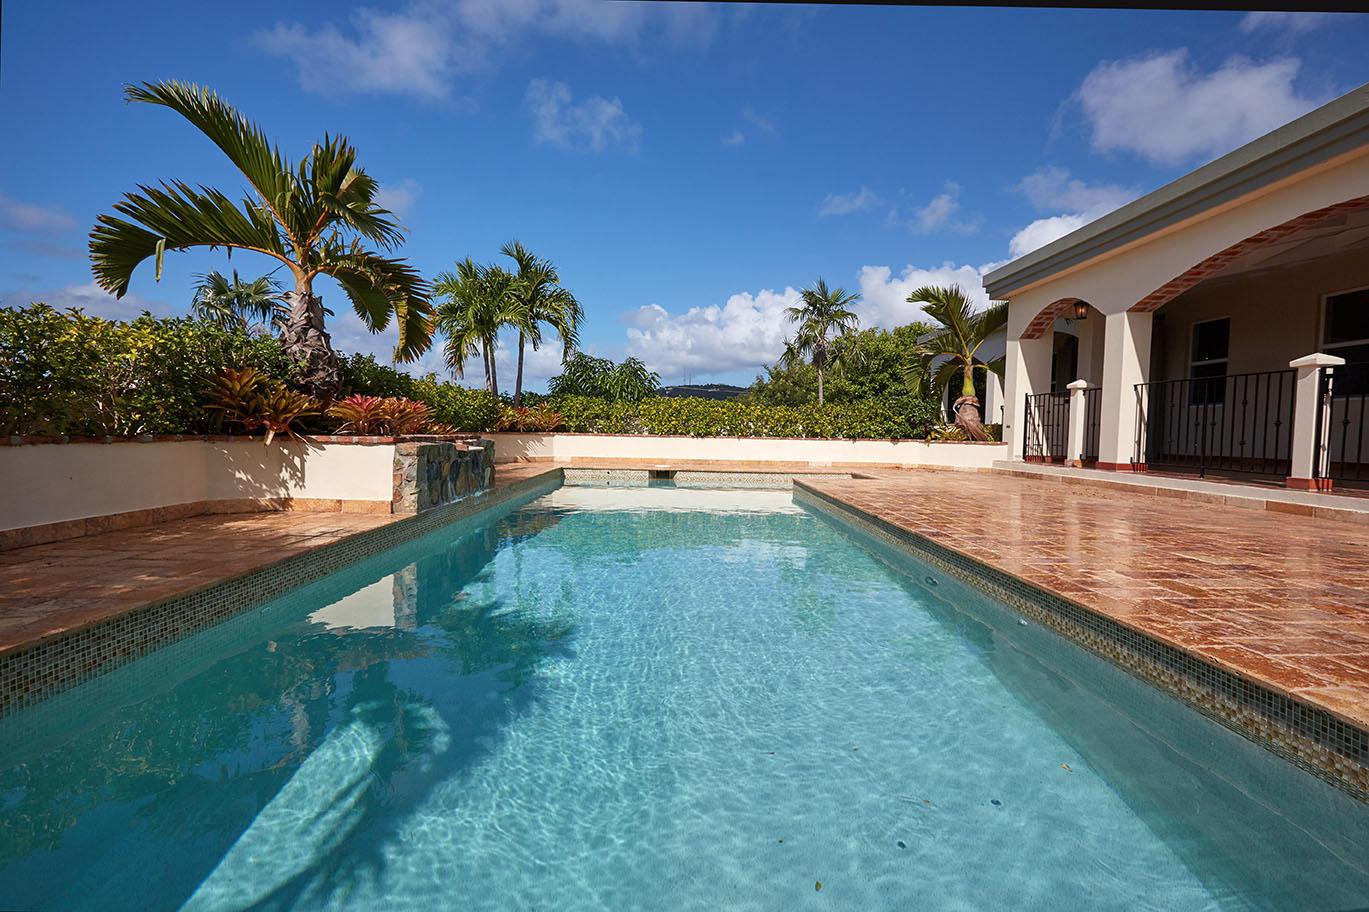 Single Family Home for Sale at 5-3 Nazareth RH 5-3 Nazareth RH St Thomas, Virgin Islands 00802 United States Virgin Islands